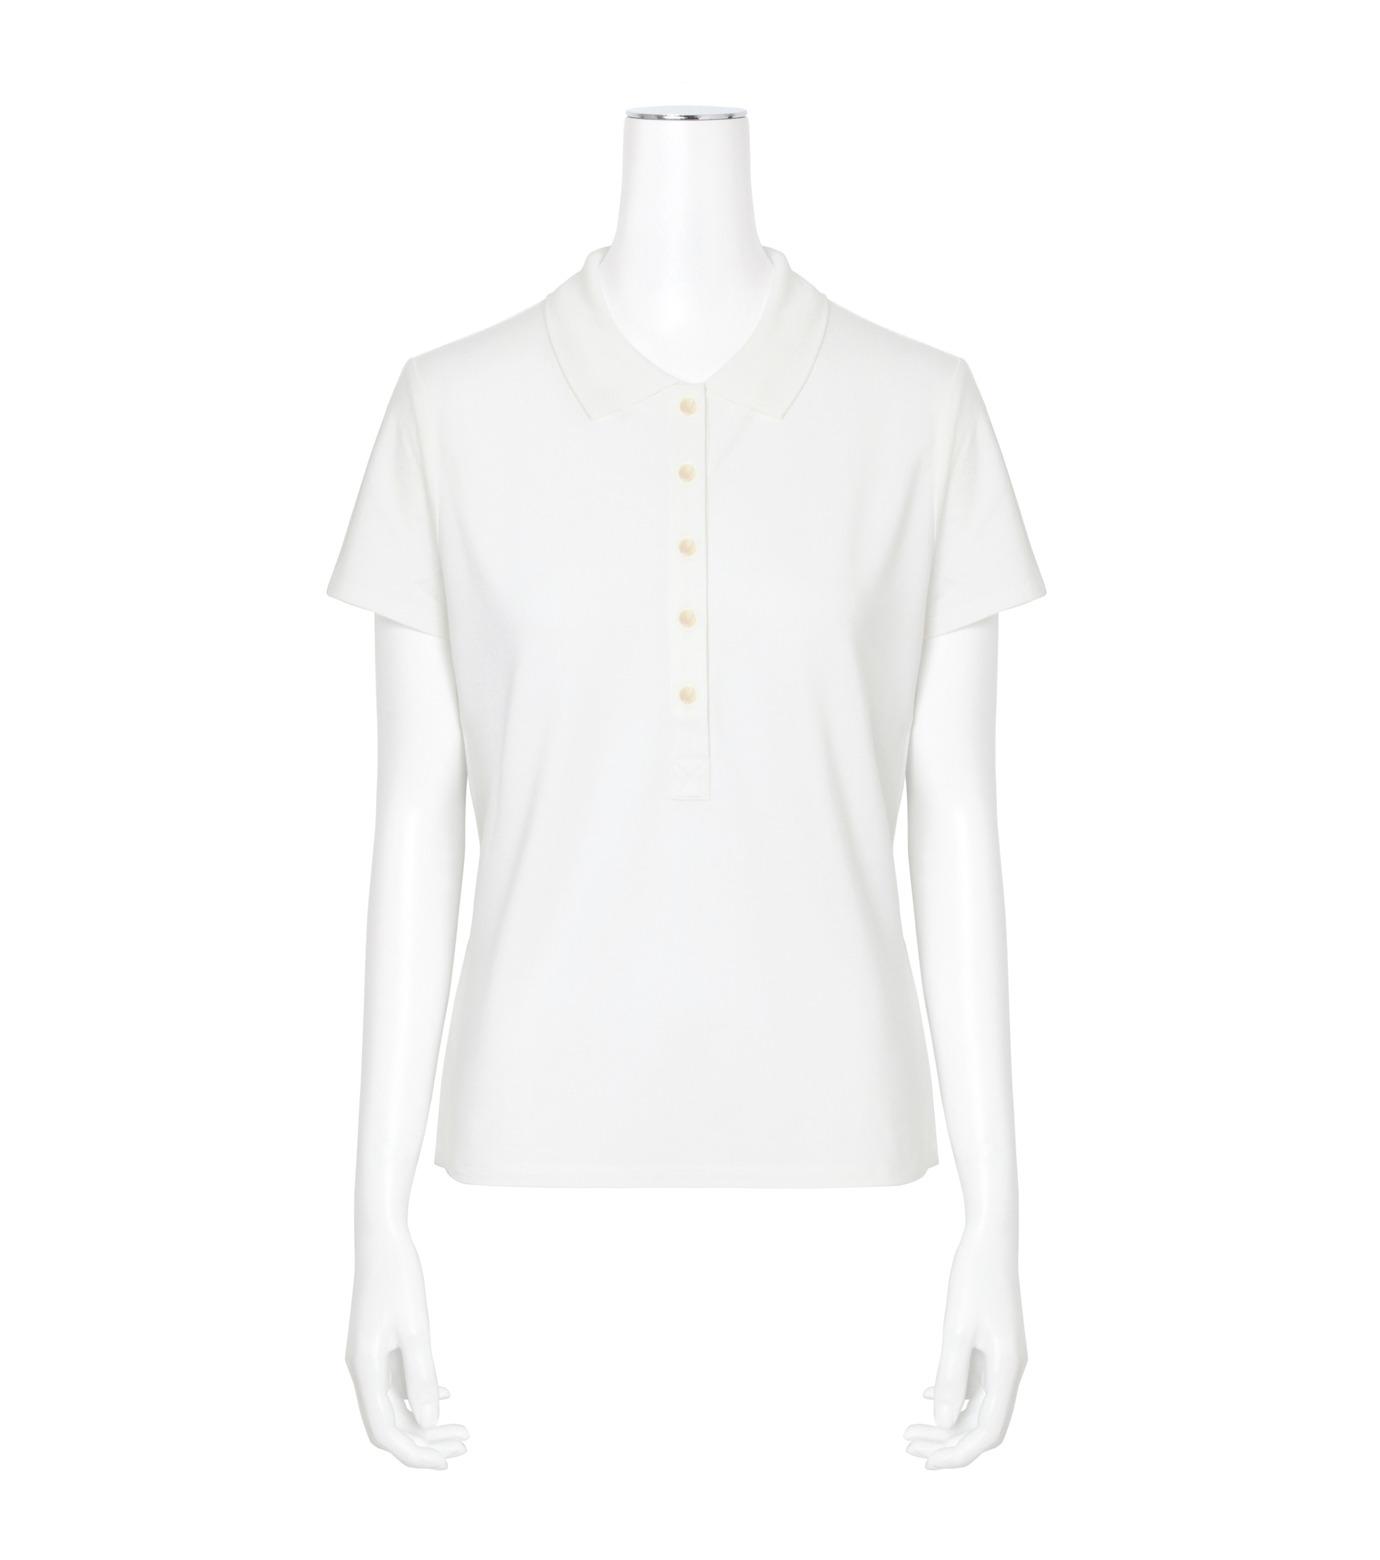 T by Alexander Wang(ティーバイ アレキサンダーワン)のSS Polo Tee-WHITE(カットソー/cut and sewn)-400204R17-5 拡大詳細画像1